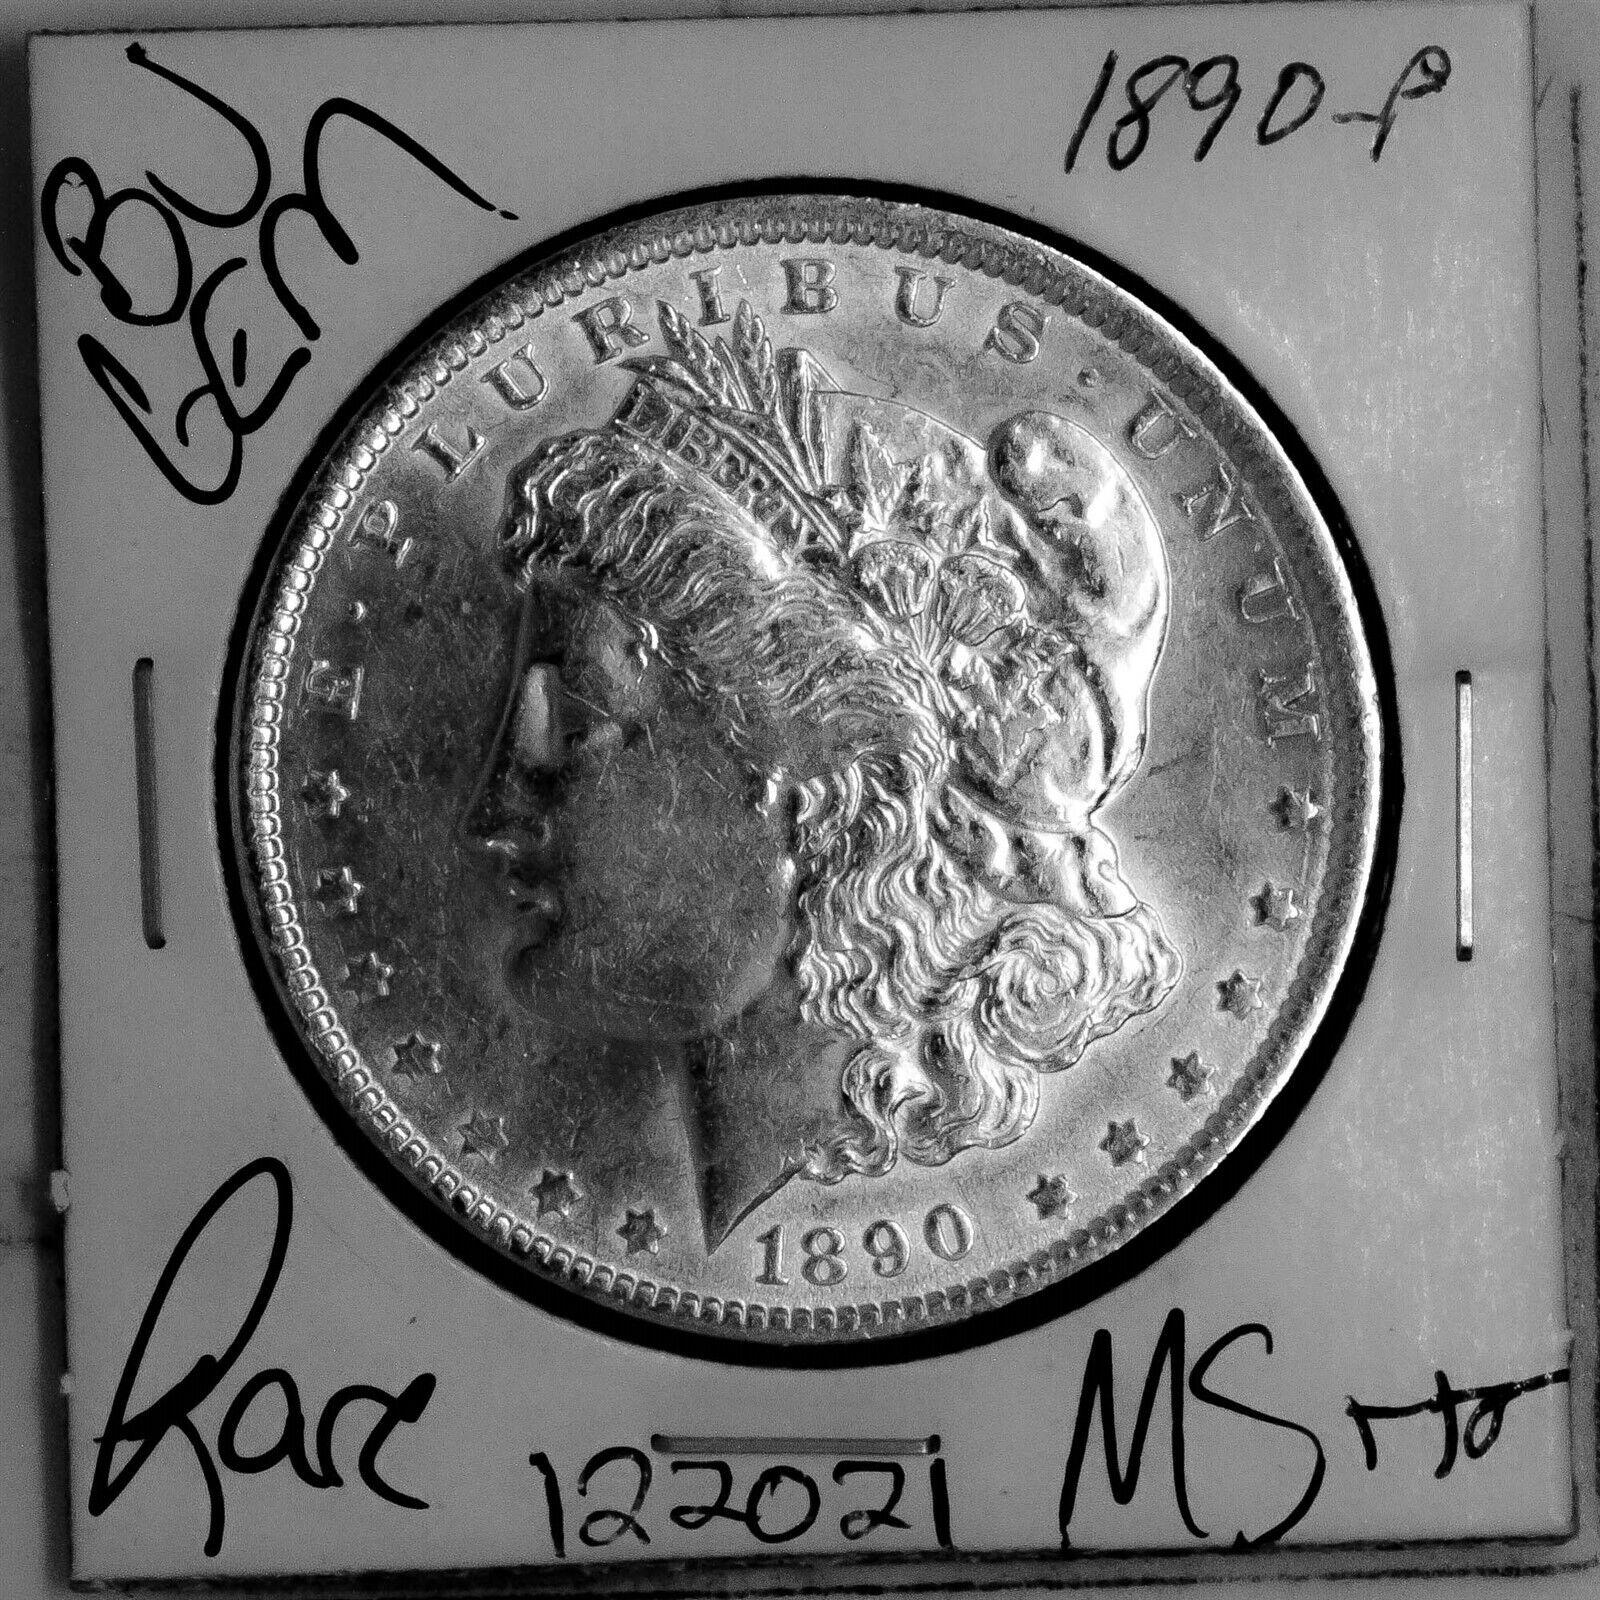 1890 GEM Morgan Silver Dollar BU MS UNC Coin Free Shipping 122021 - $56.00